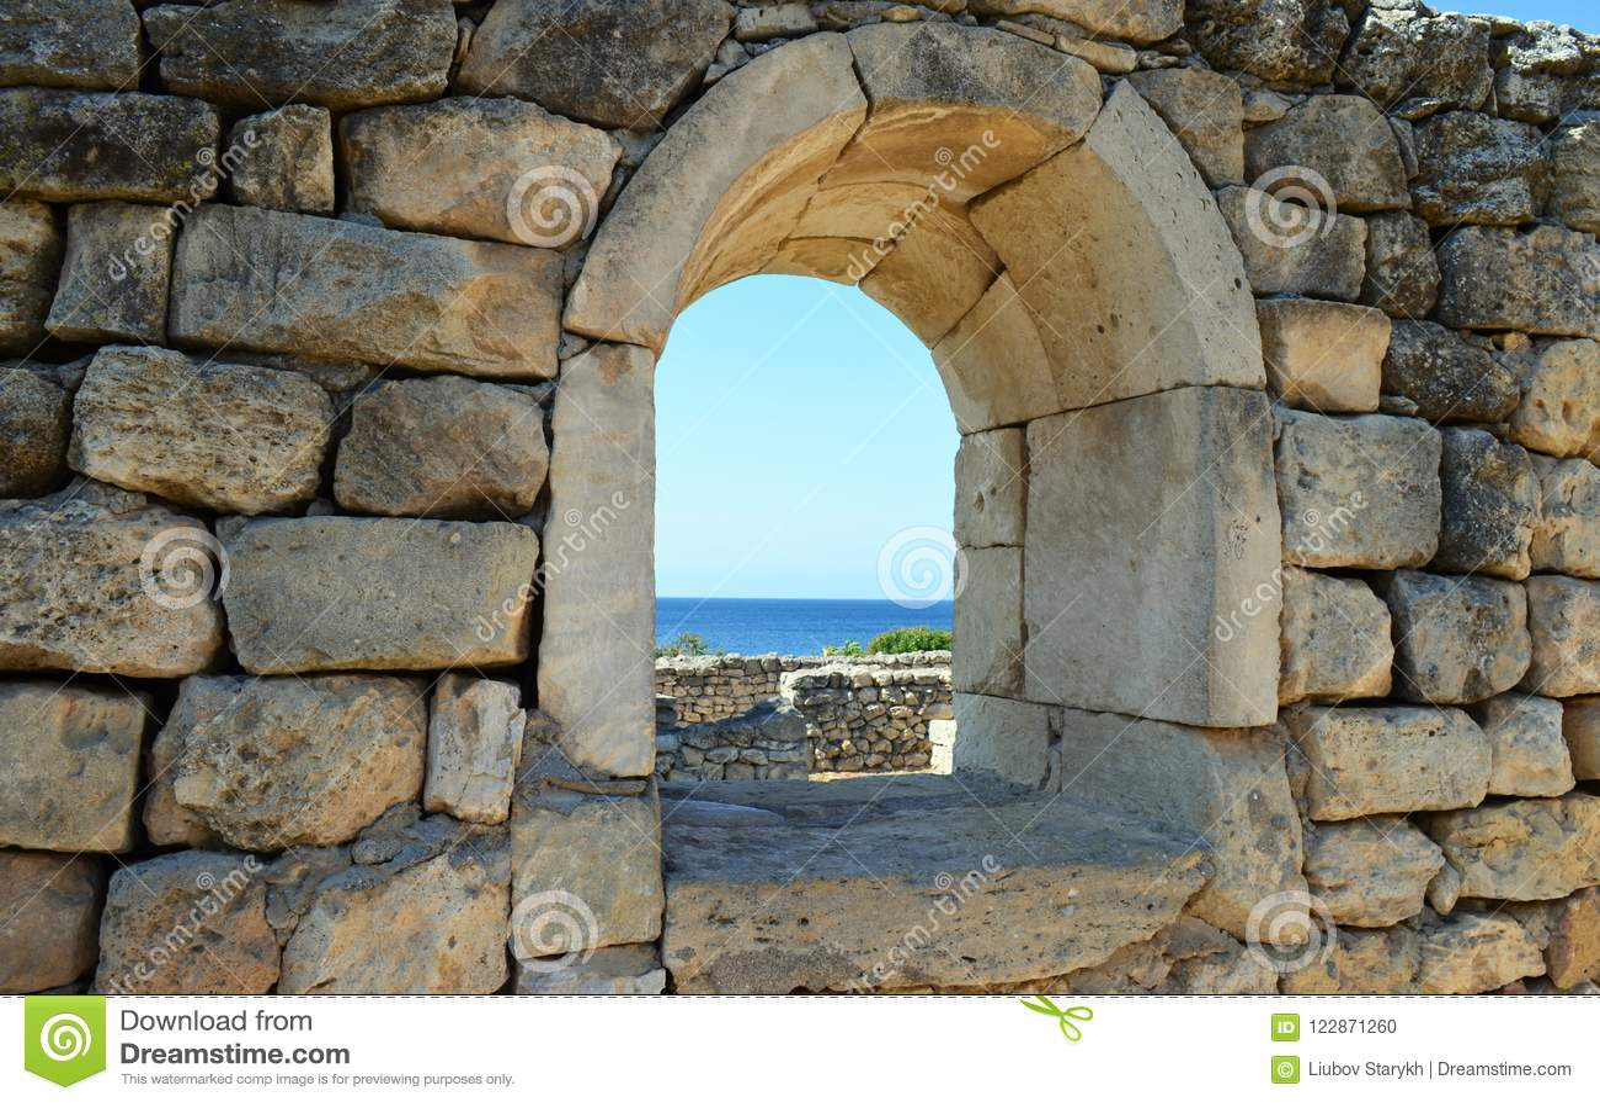 Chersonesos古城的废墟,在塞瓦斯托波尔,克里米亚